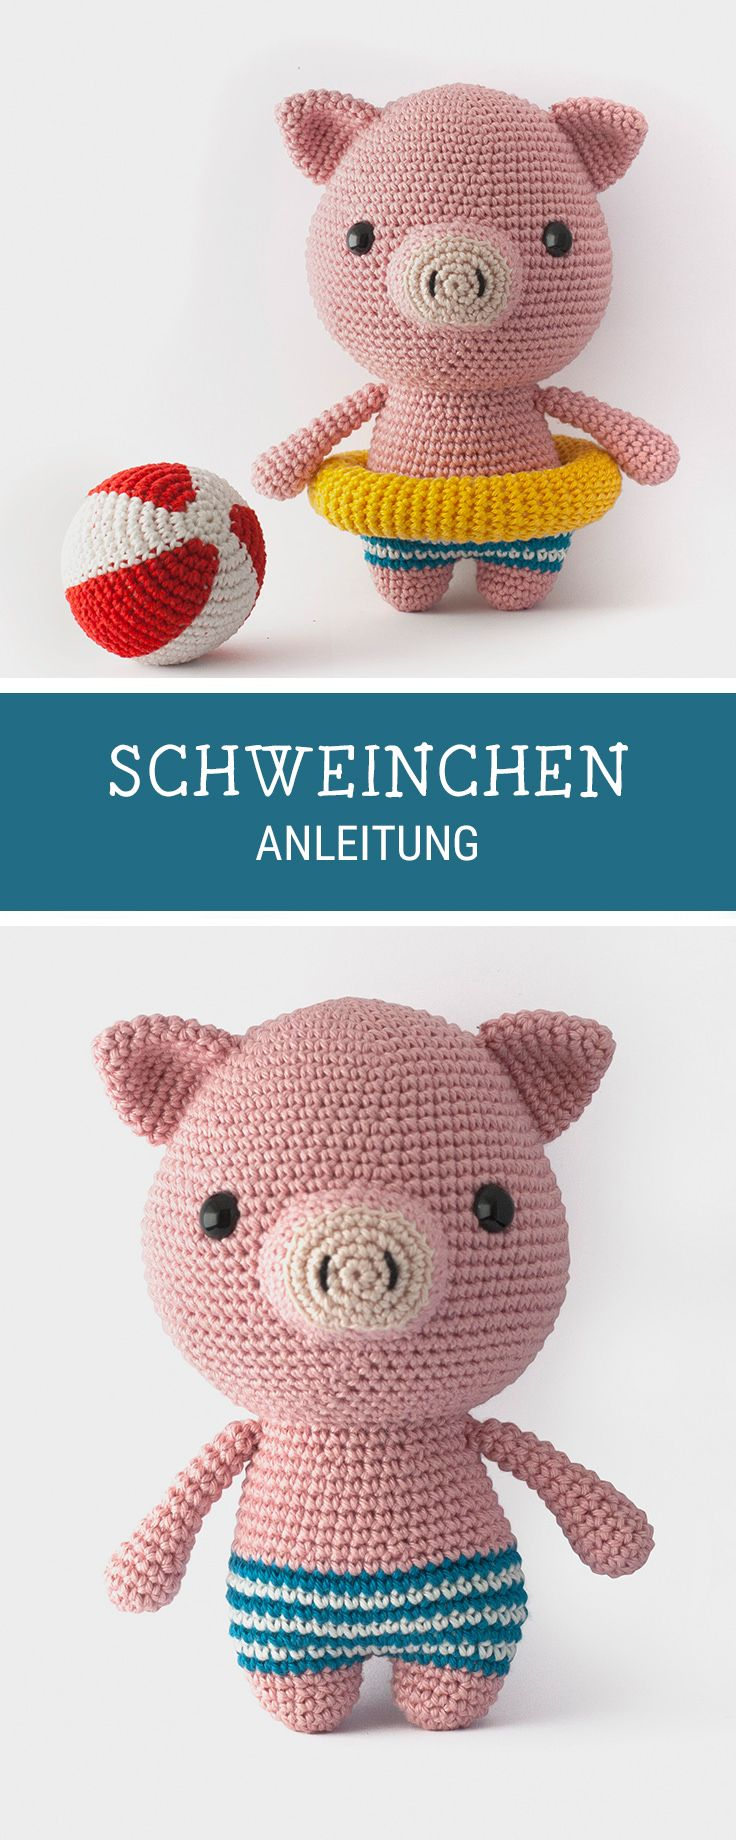 2430 best Baby images on Pinterest | Amigurumi patterns, Crochet ...